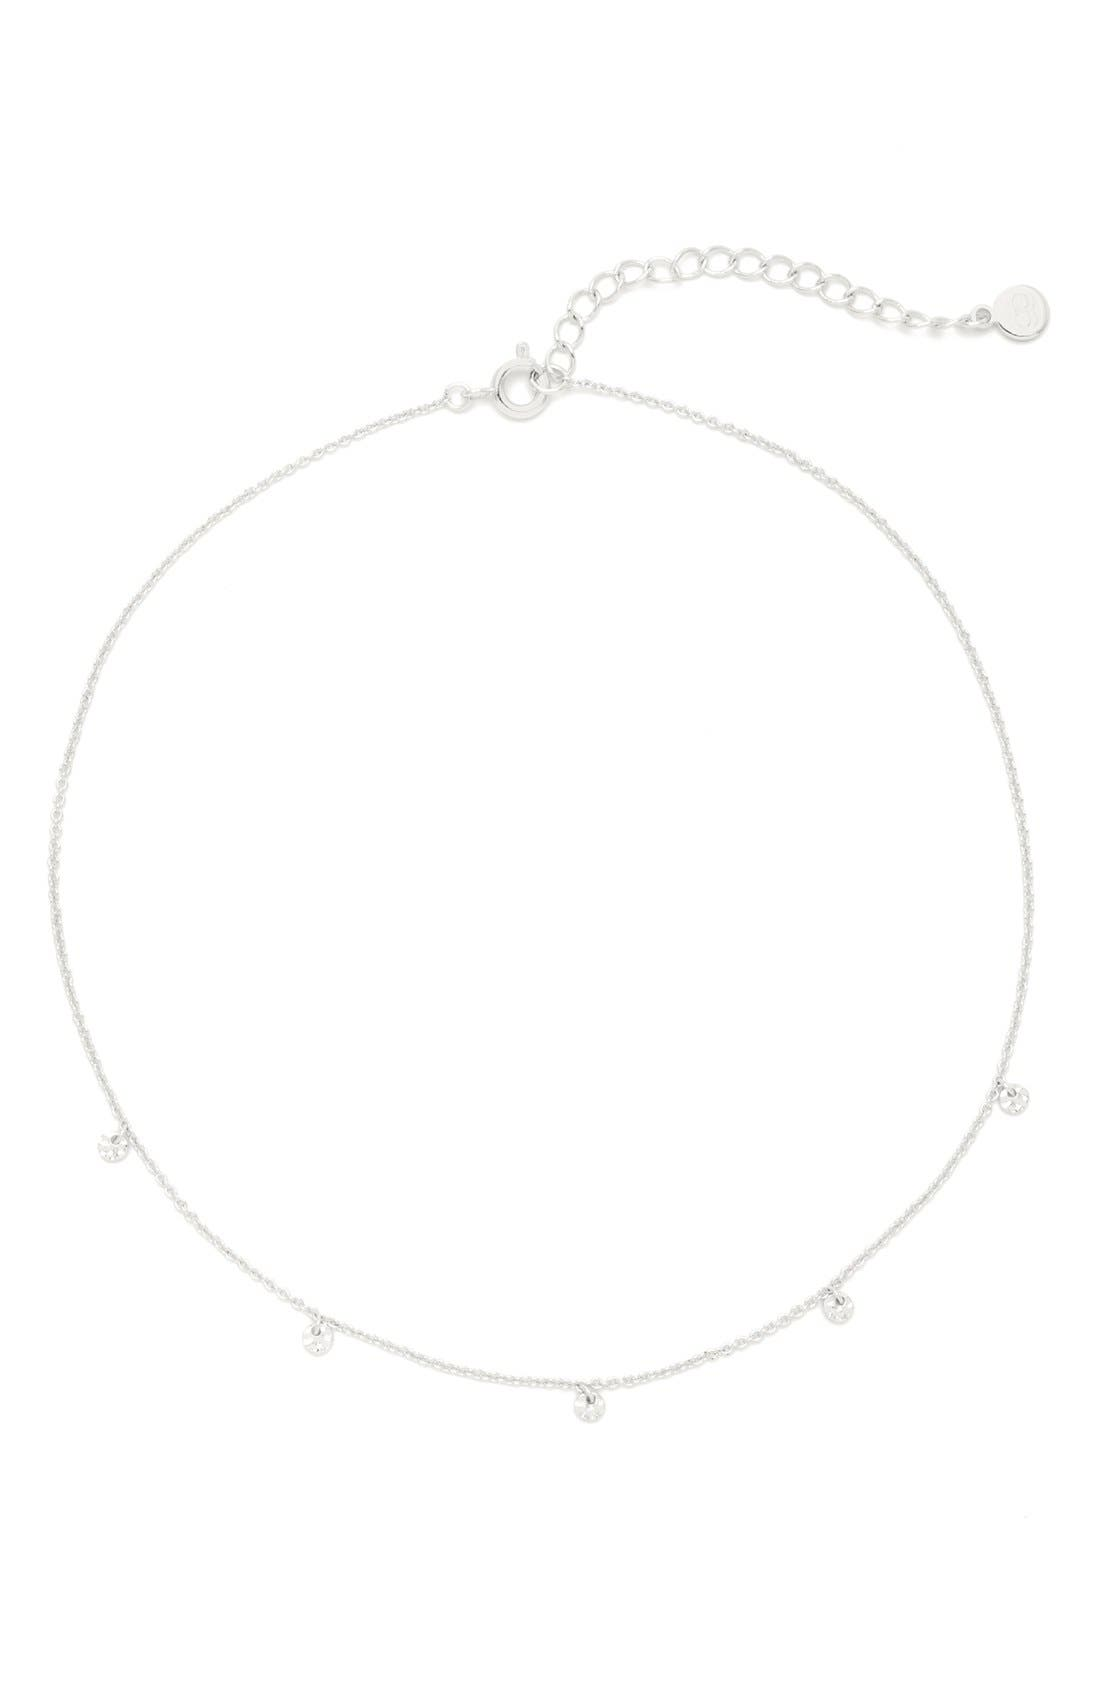 Main Image - gorjana Charm Choker Necklace